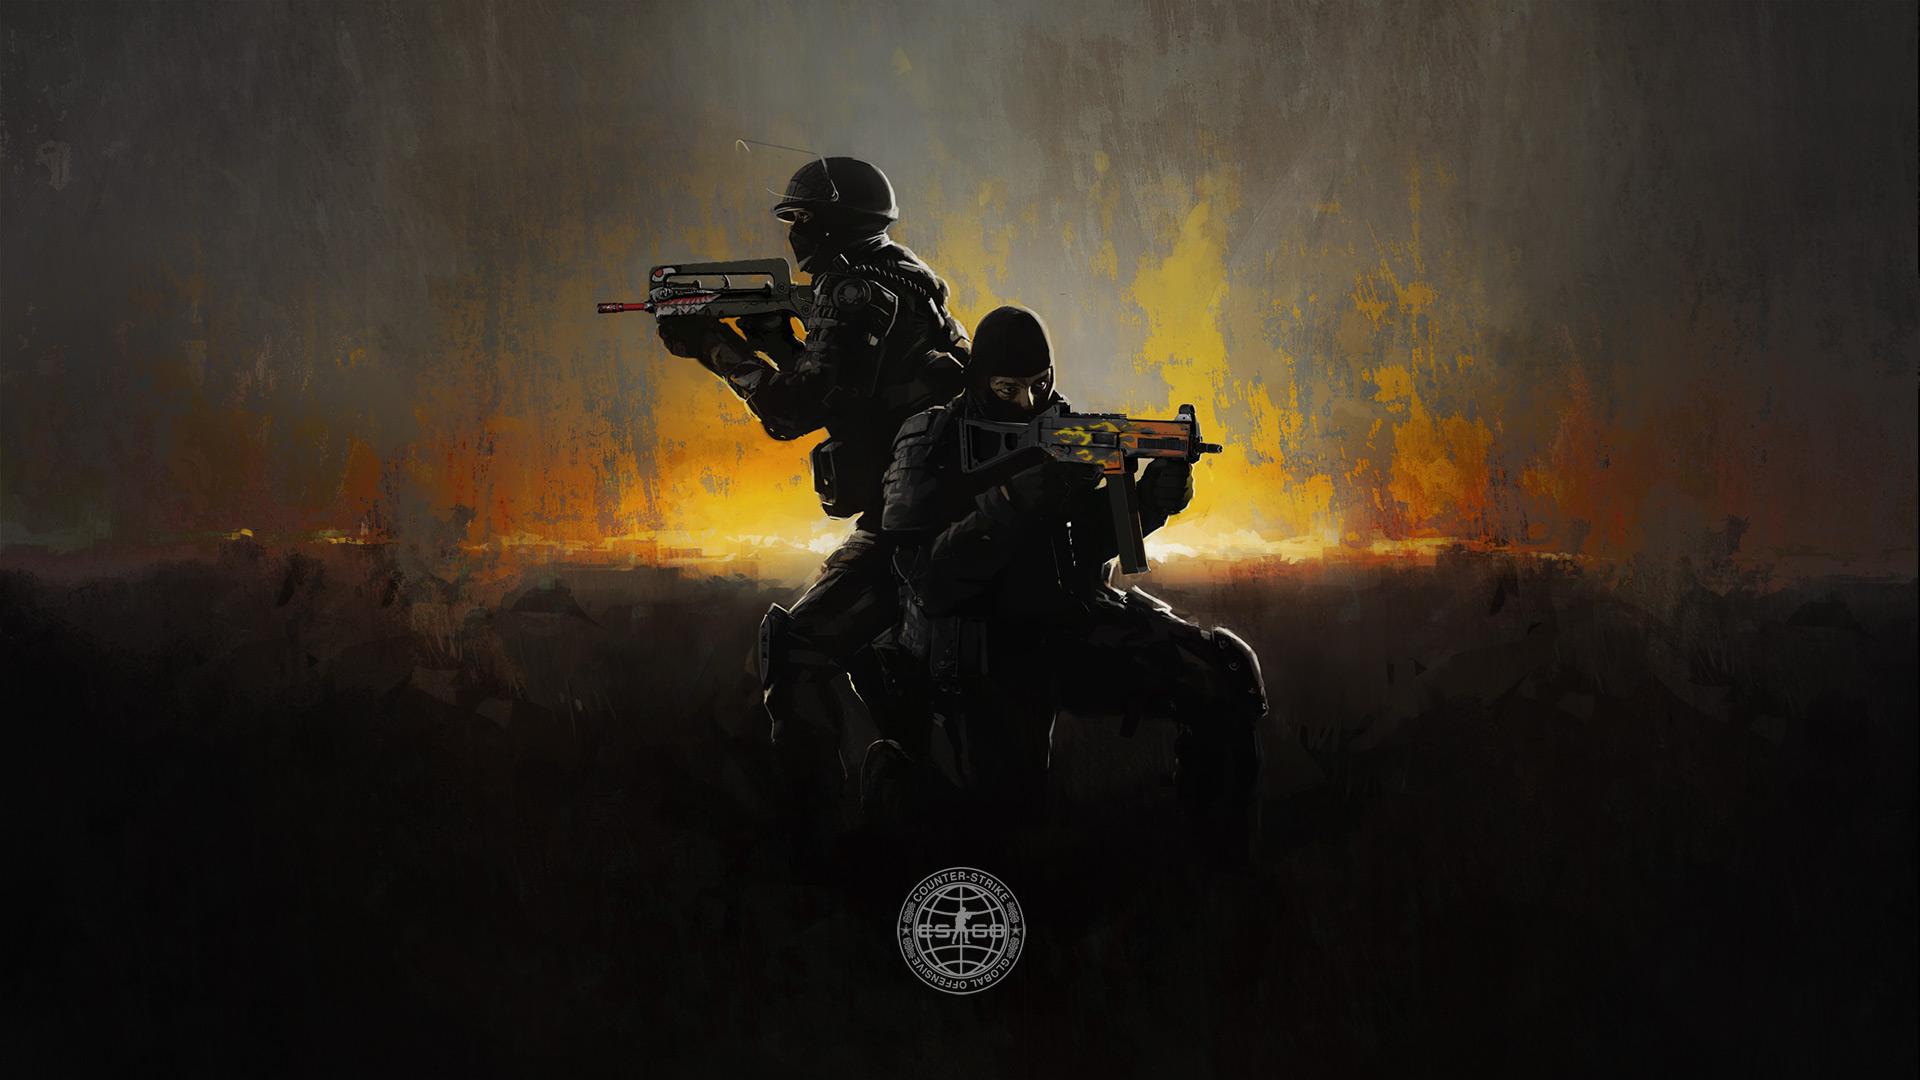 csgo counter strike global offensive csgo trkiye csgo aim ayarlar 1920x1080